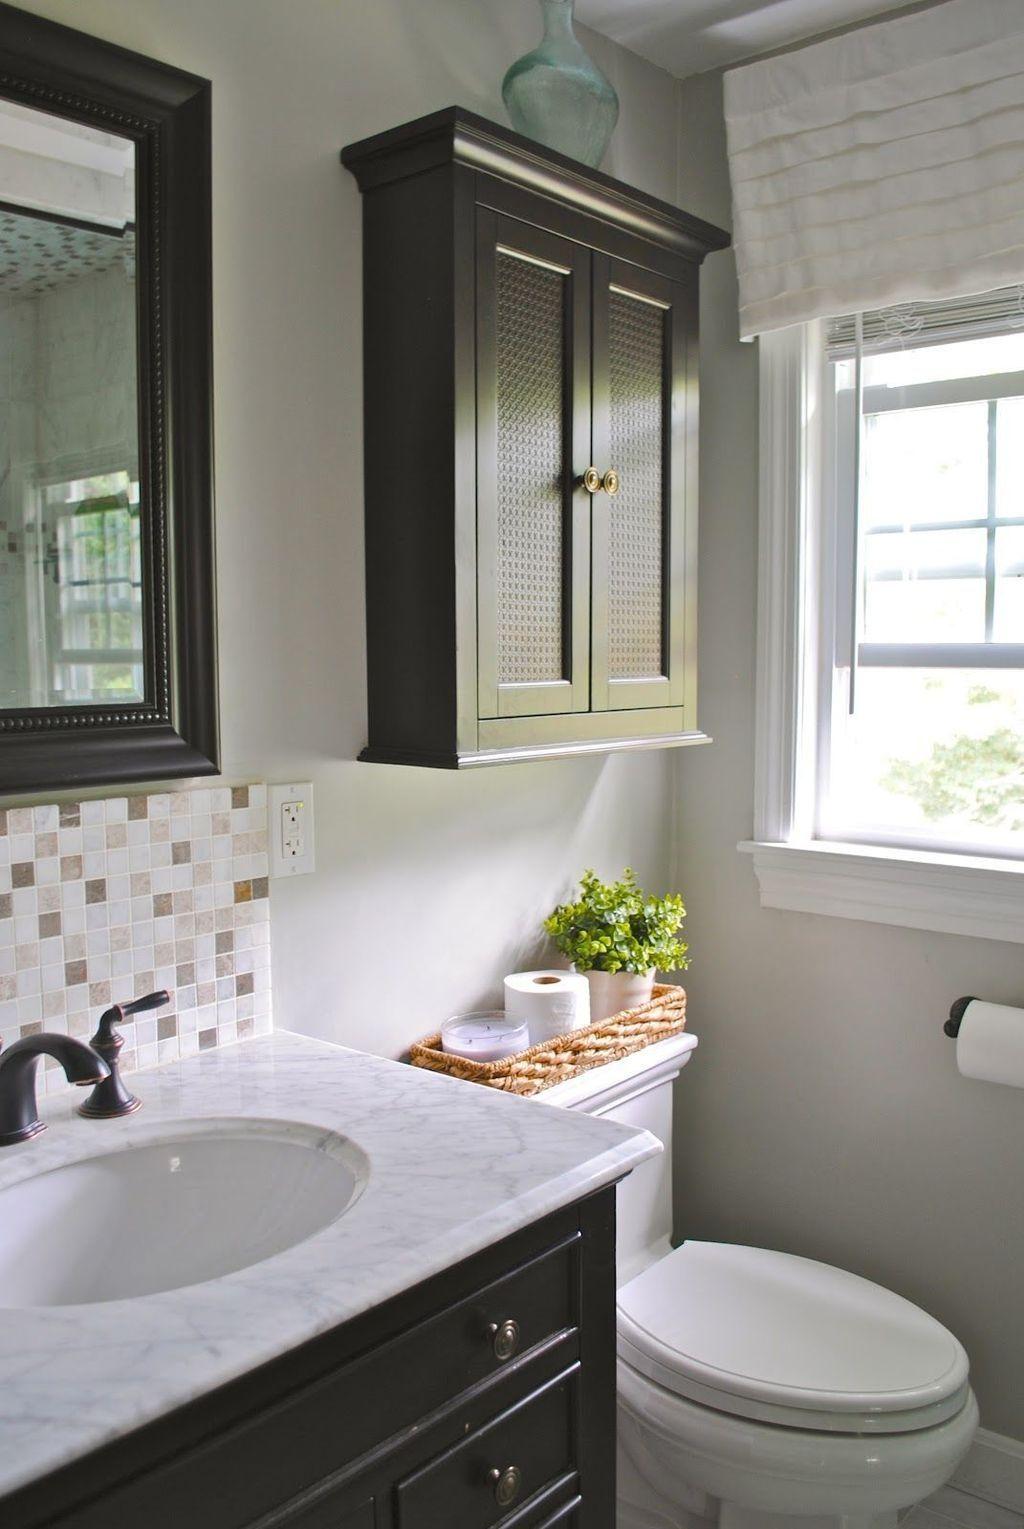 42 Gorgeous Kitchen Cabinets Design Ideas Beautiful Bathroom Cabinets Cabinet Above Toilet Bathroom Storage Cabinet